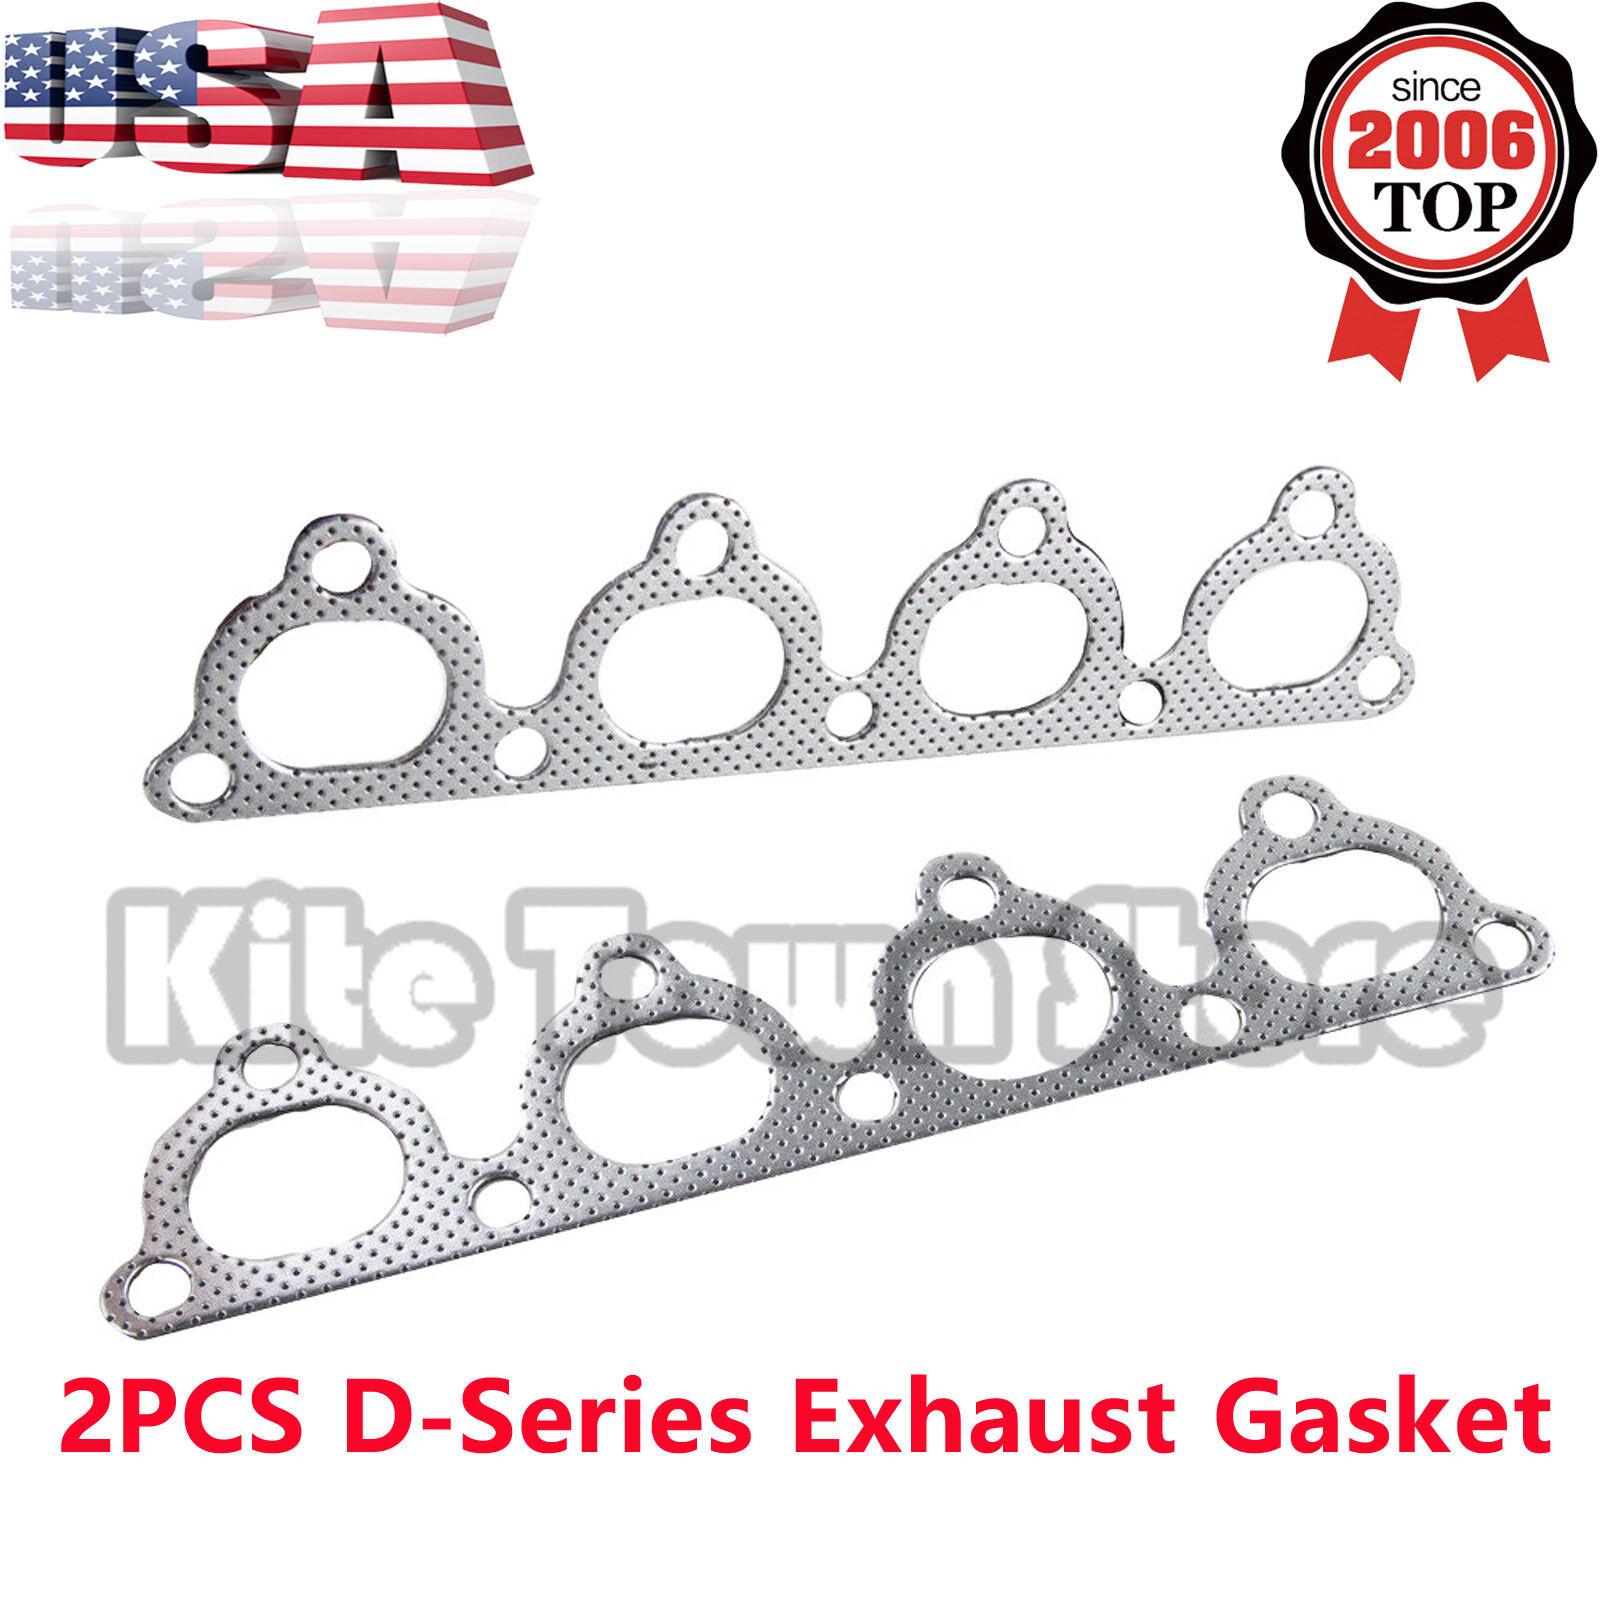 2PCS D-Series Exhaust Header Manifold For Honda Graphite Aluminum Gasket D15 D16